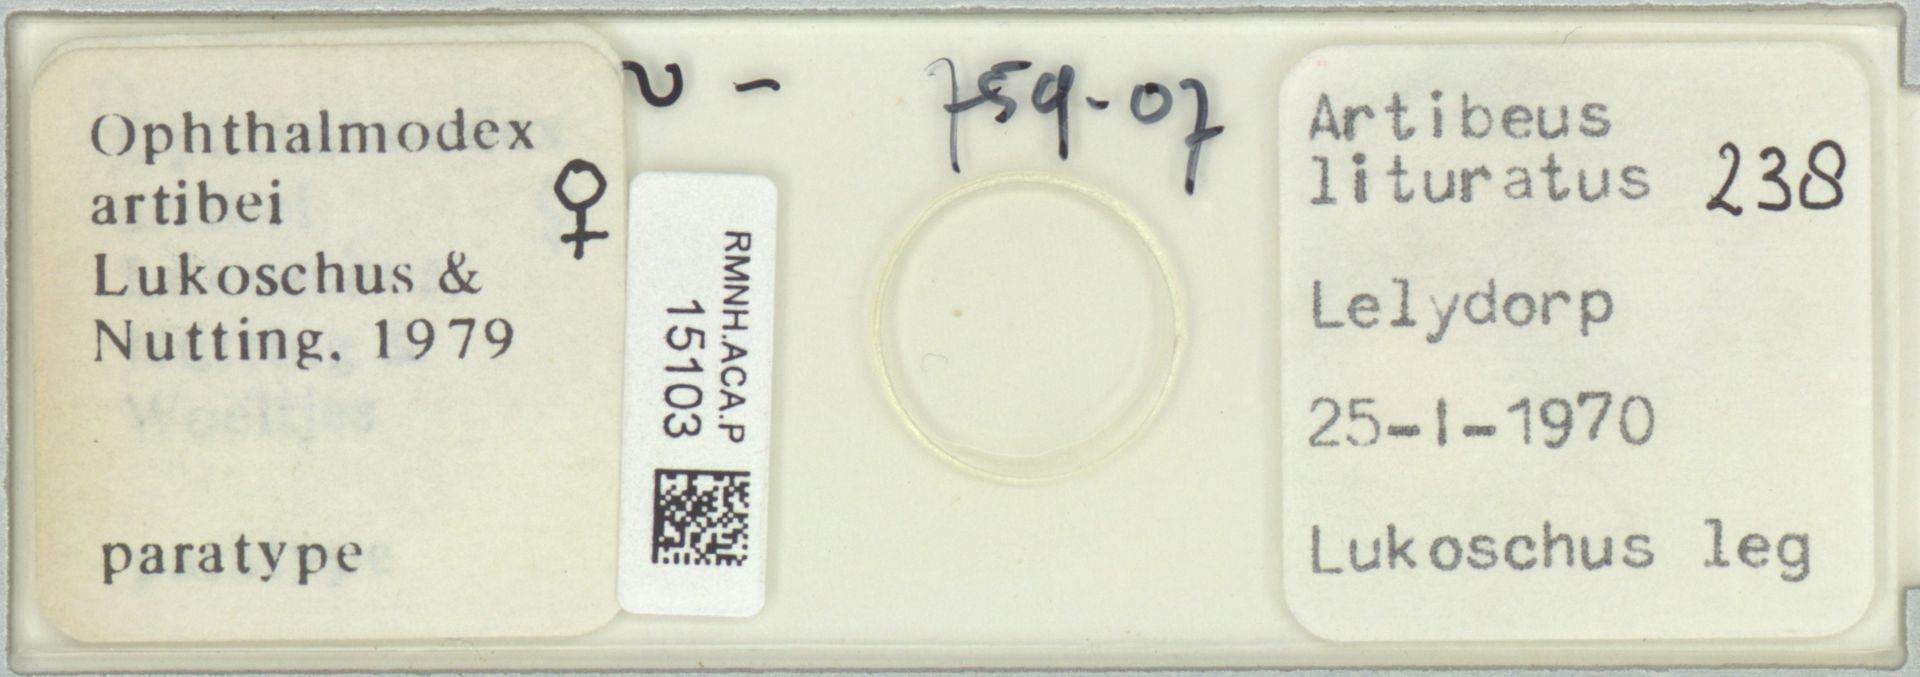 RMNH.ACA.P.15103   Ophthalmodex artibei Lukoschus & Nutting, 1979